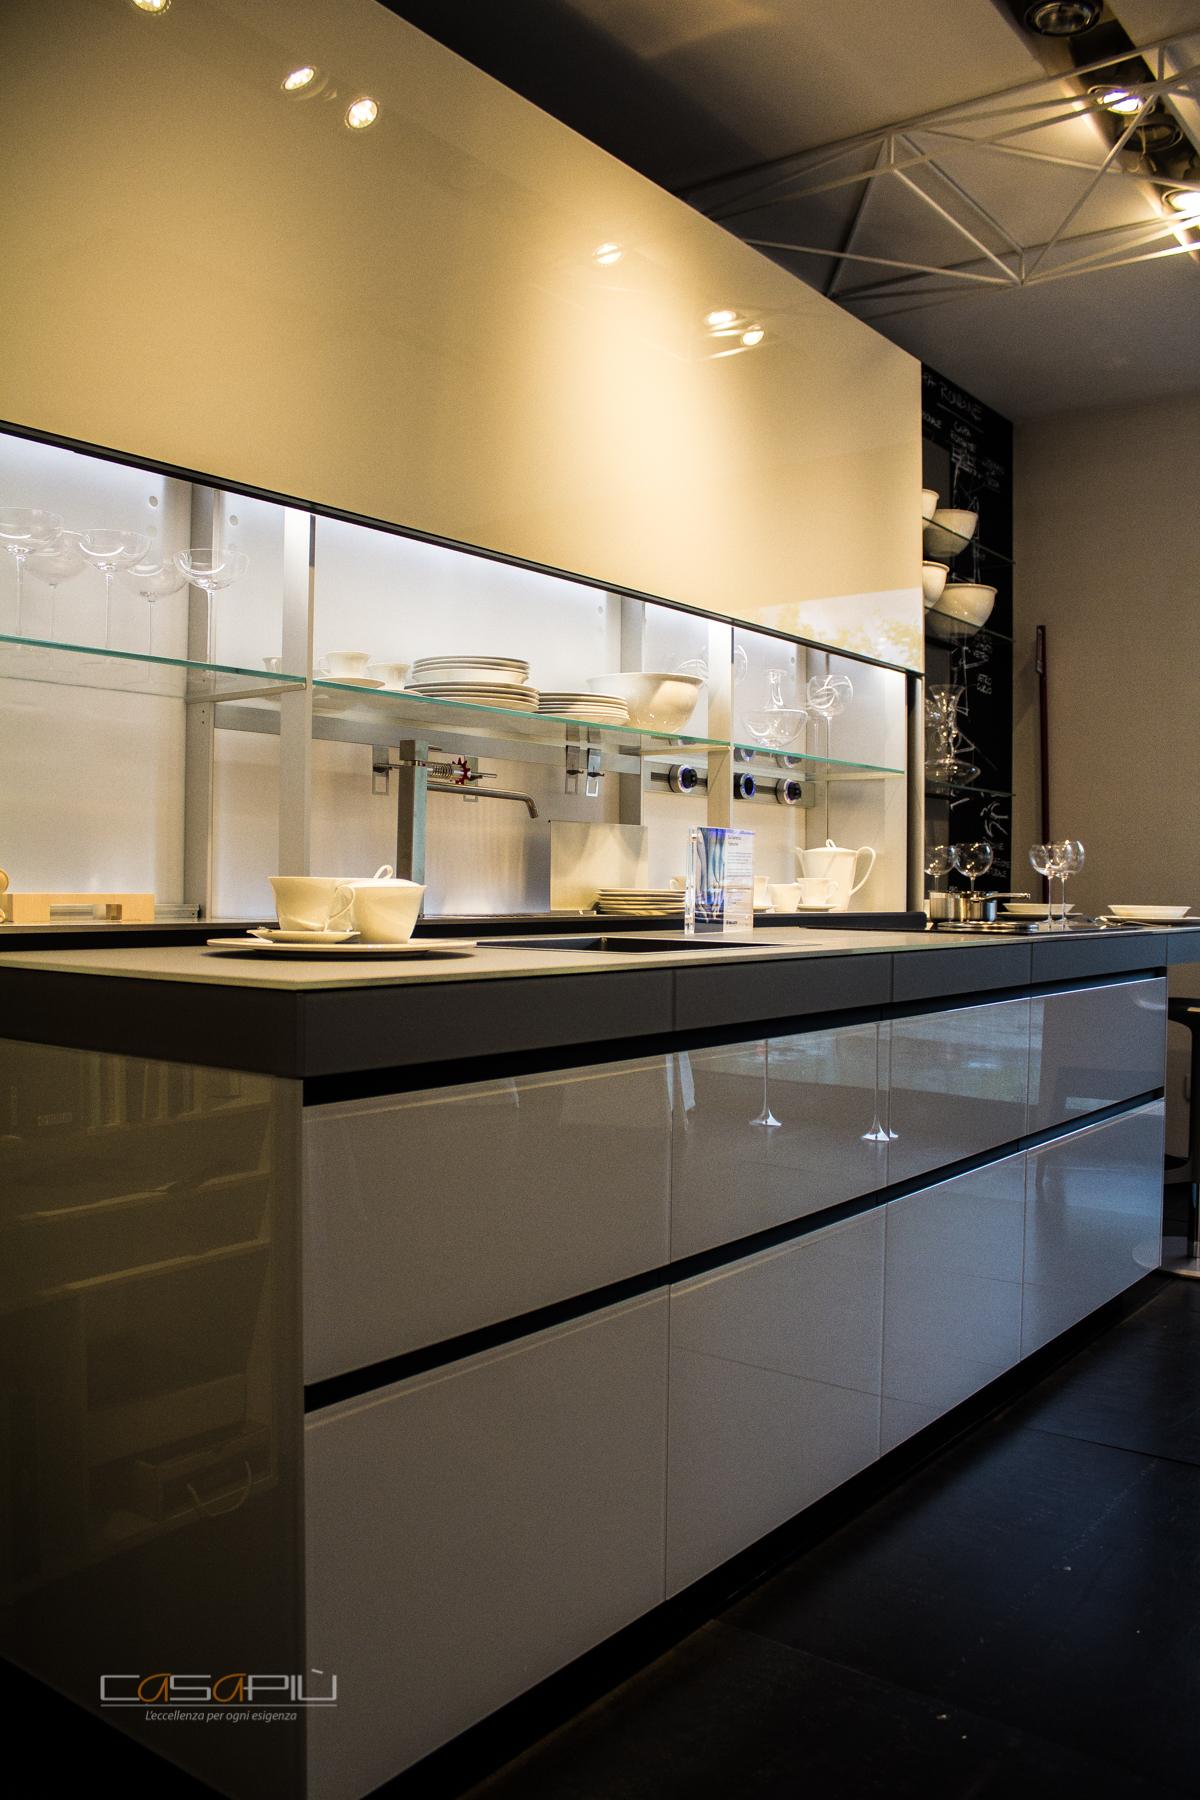 Cuisine prix r duit genius loci de valcucine casa pi - Casa piu arredamenti ...